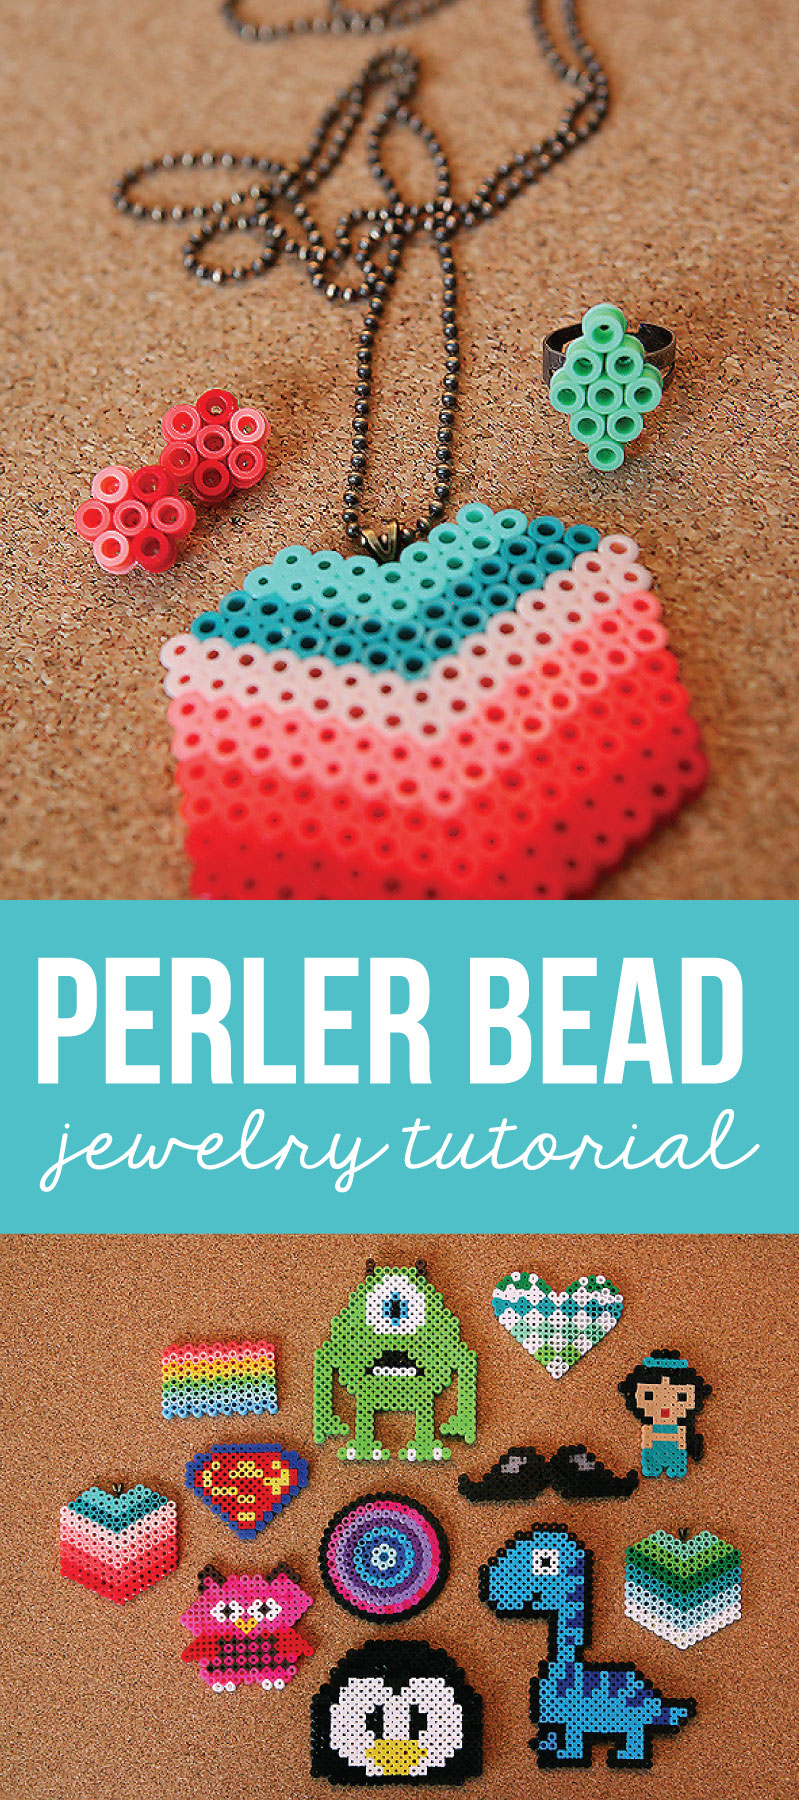 Perler Beads DIY Jewelry Tutorial - learn how to make fun, inexpensive jewelry!